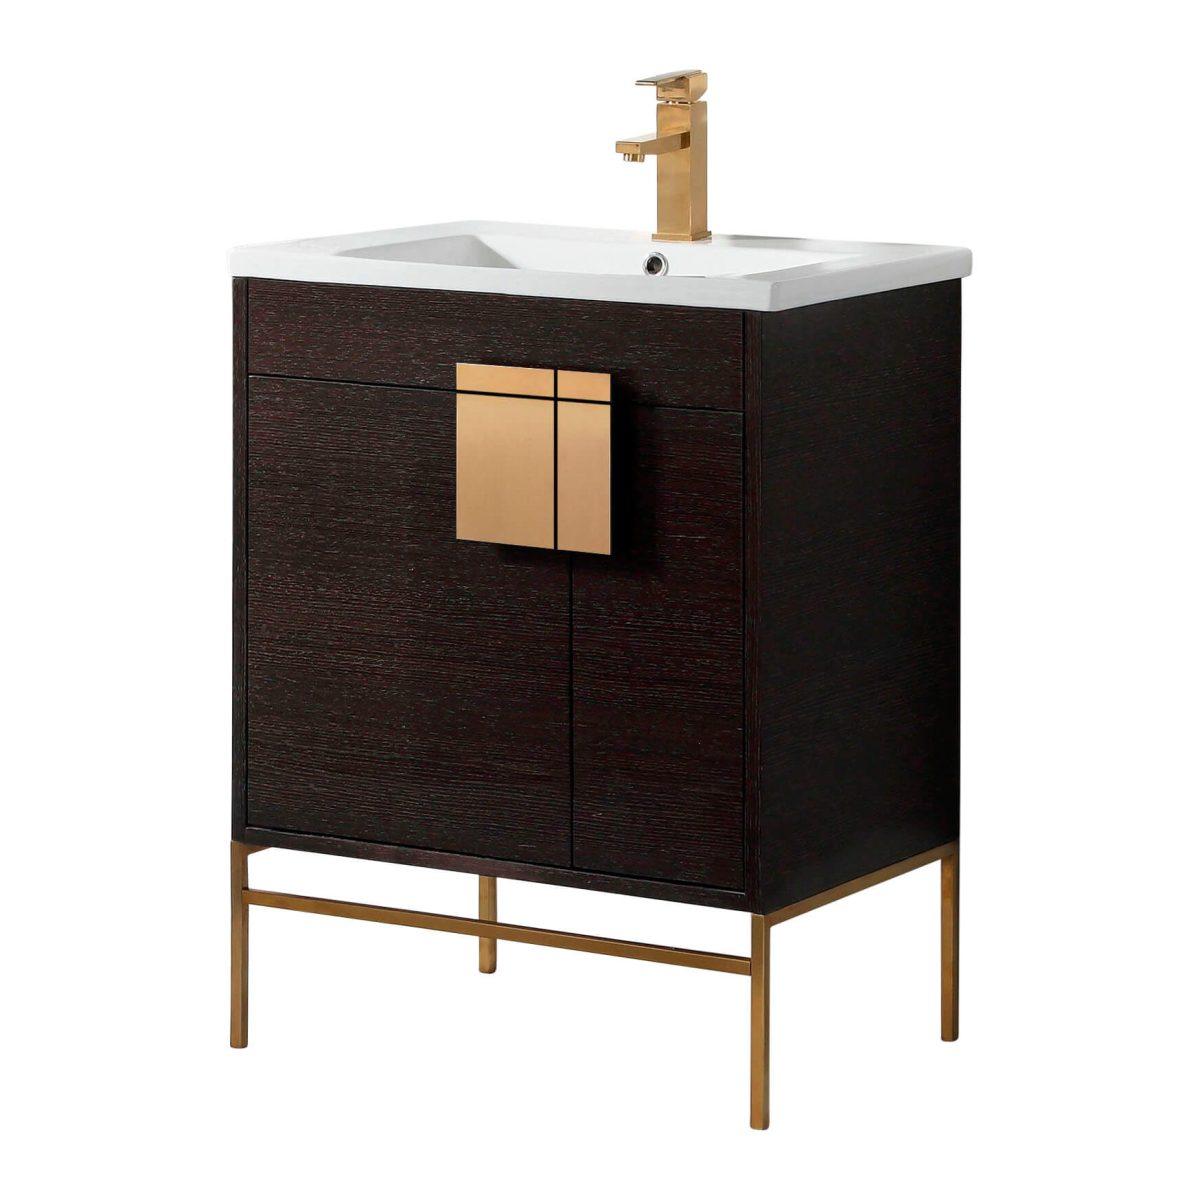 "Shawbridge 30"" Modern Bathroom Vanity  Black Oak Straight Grain with Satin Brass Hardware"